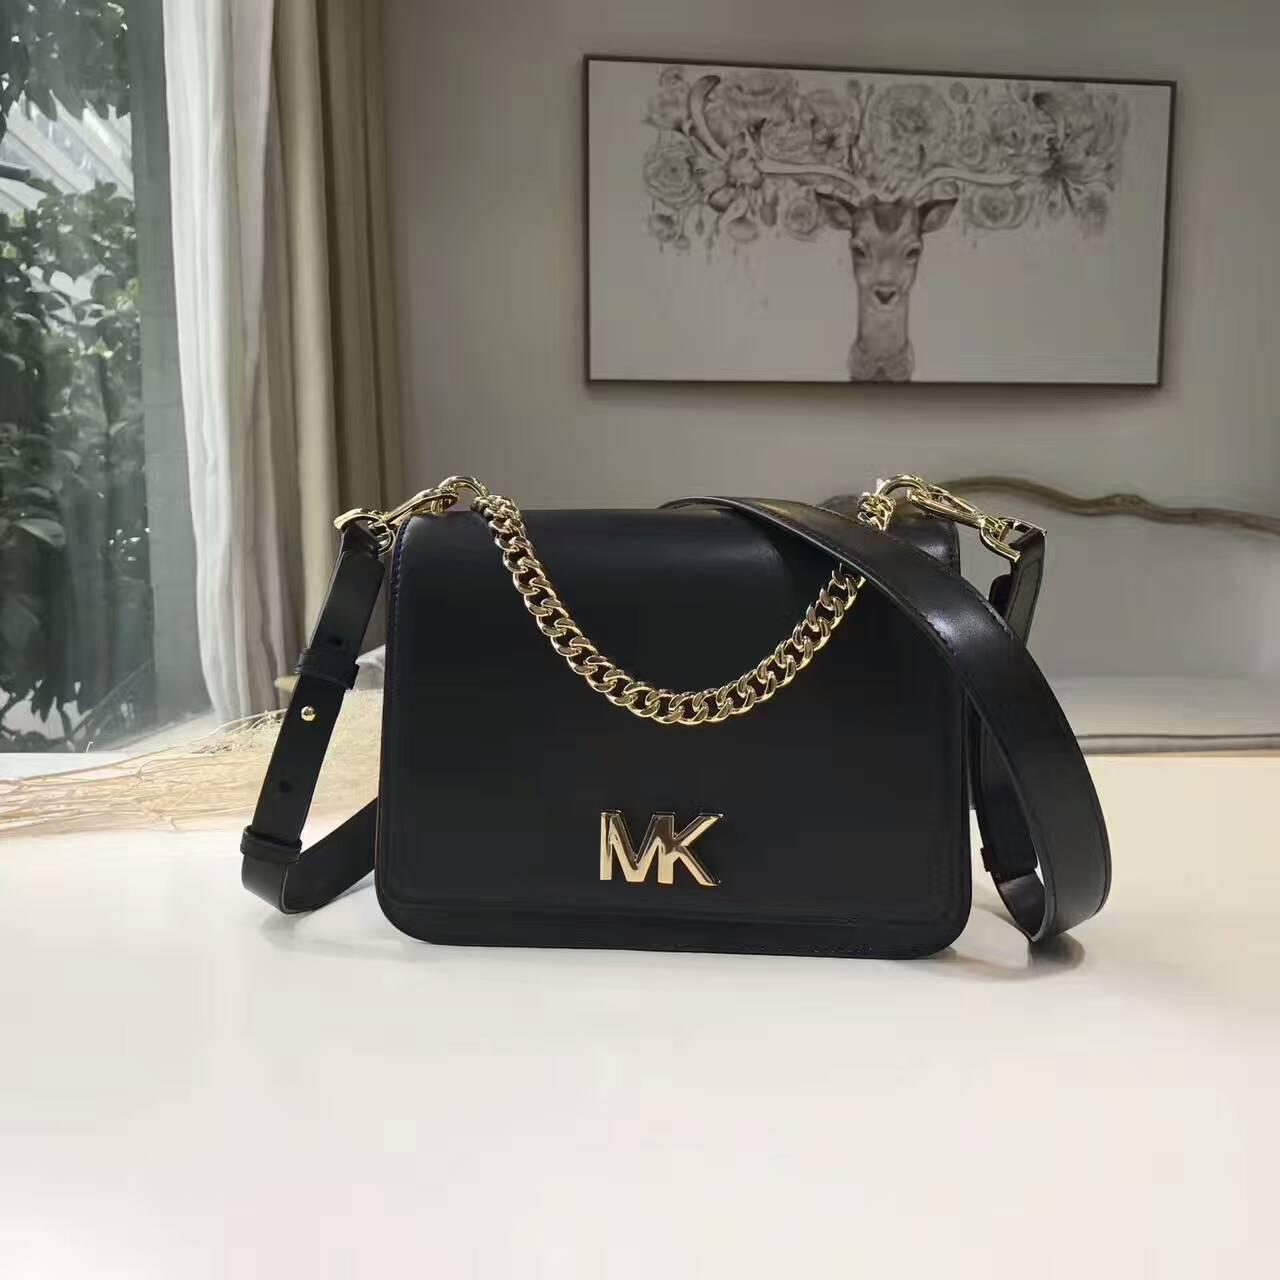 OUTLET美國代購 Michael Kors MK 字母LOGO鍊條翻蓋方包 鍊條包 斜背包 肩背包 黑色